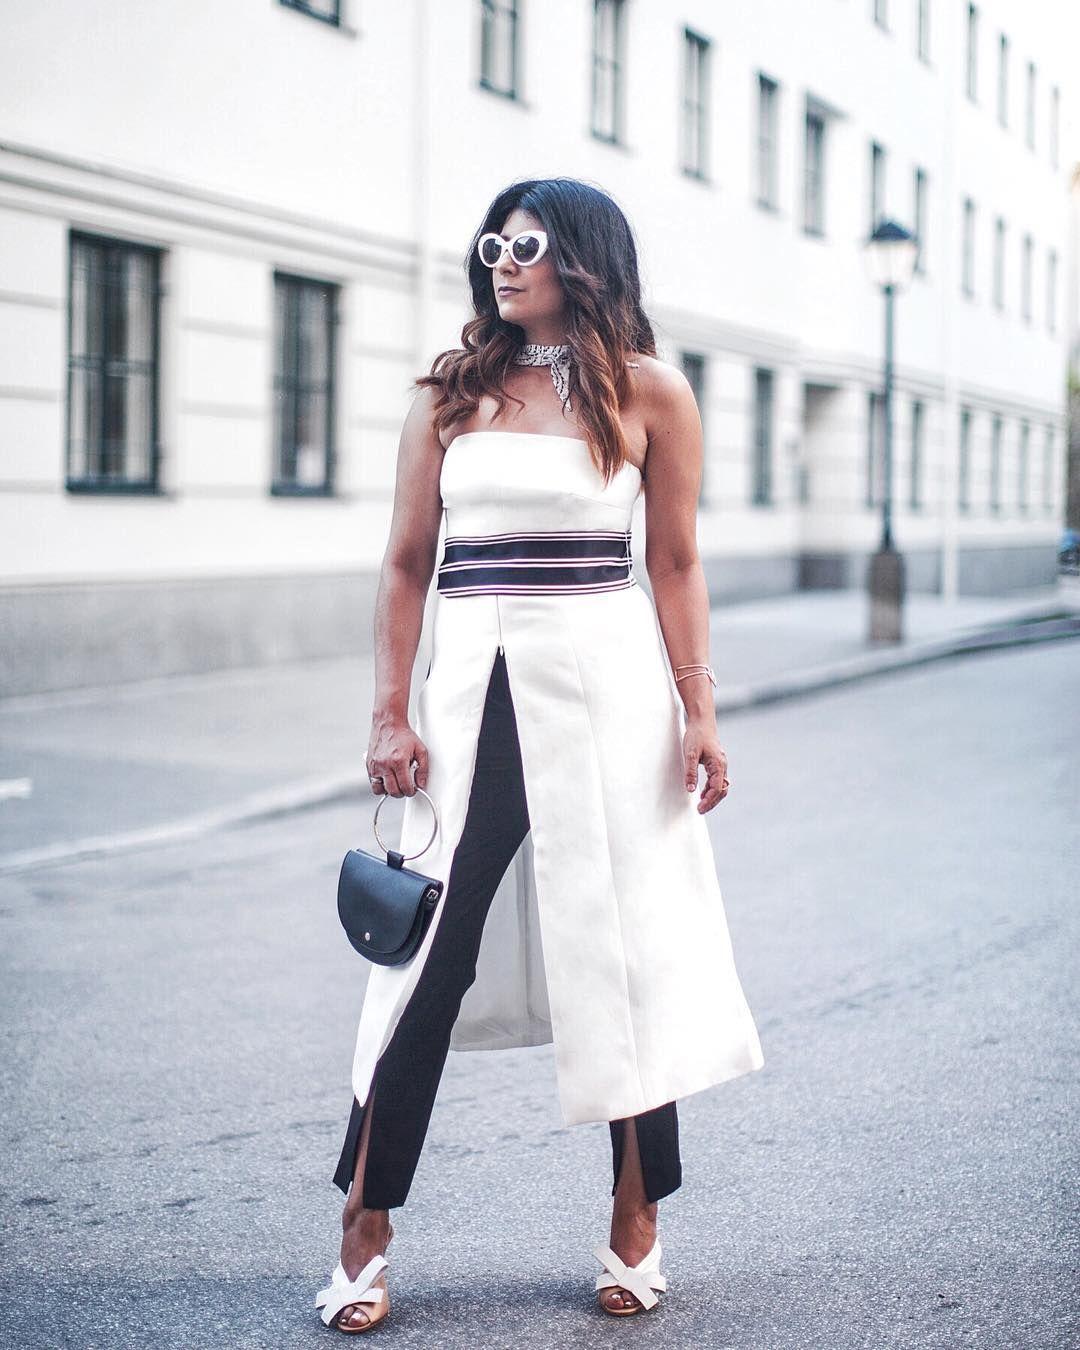 "Gefällt 1,024 Mal, 9 Kommentare - Laura Dittrich (@fashionlandscape) auf Instagram: ""Effortless weekend style/ the ultimate summer uniform. 'Cause nothing beats the ease of denim,…"""